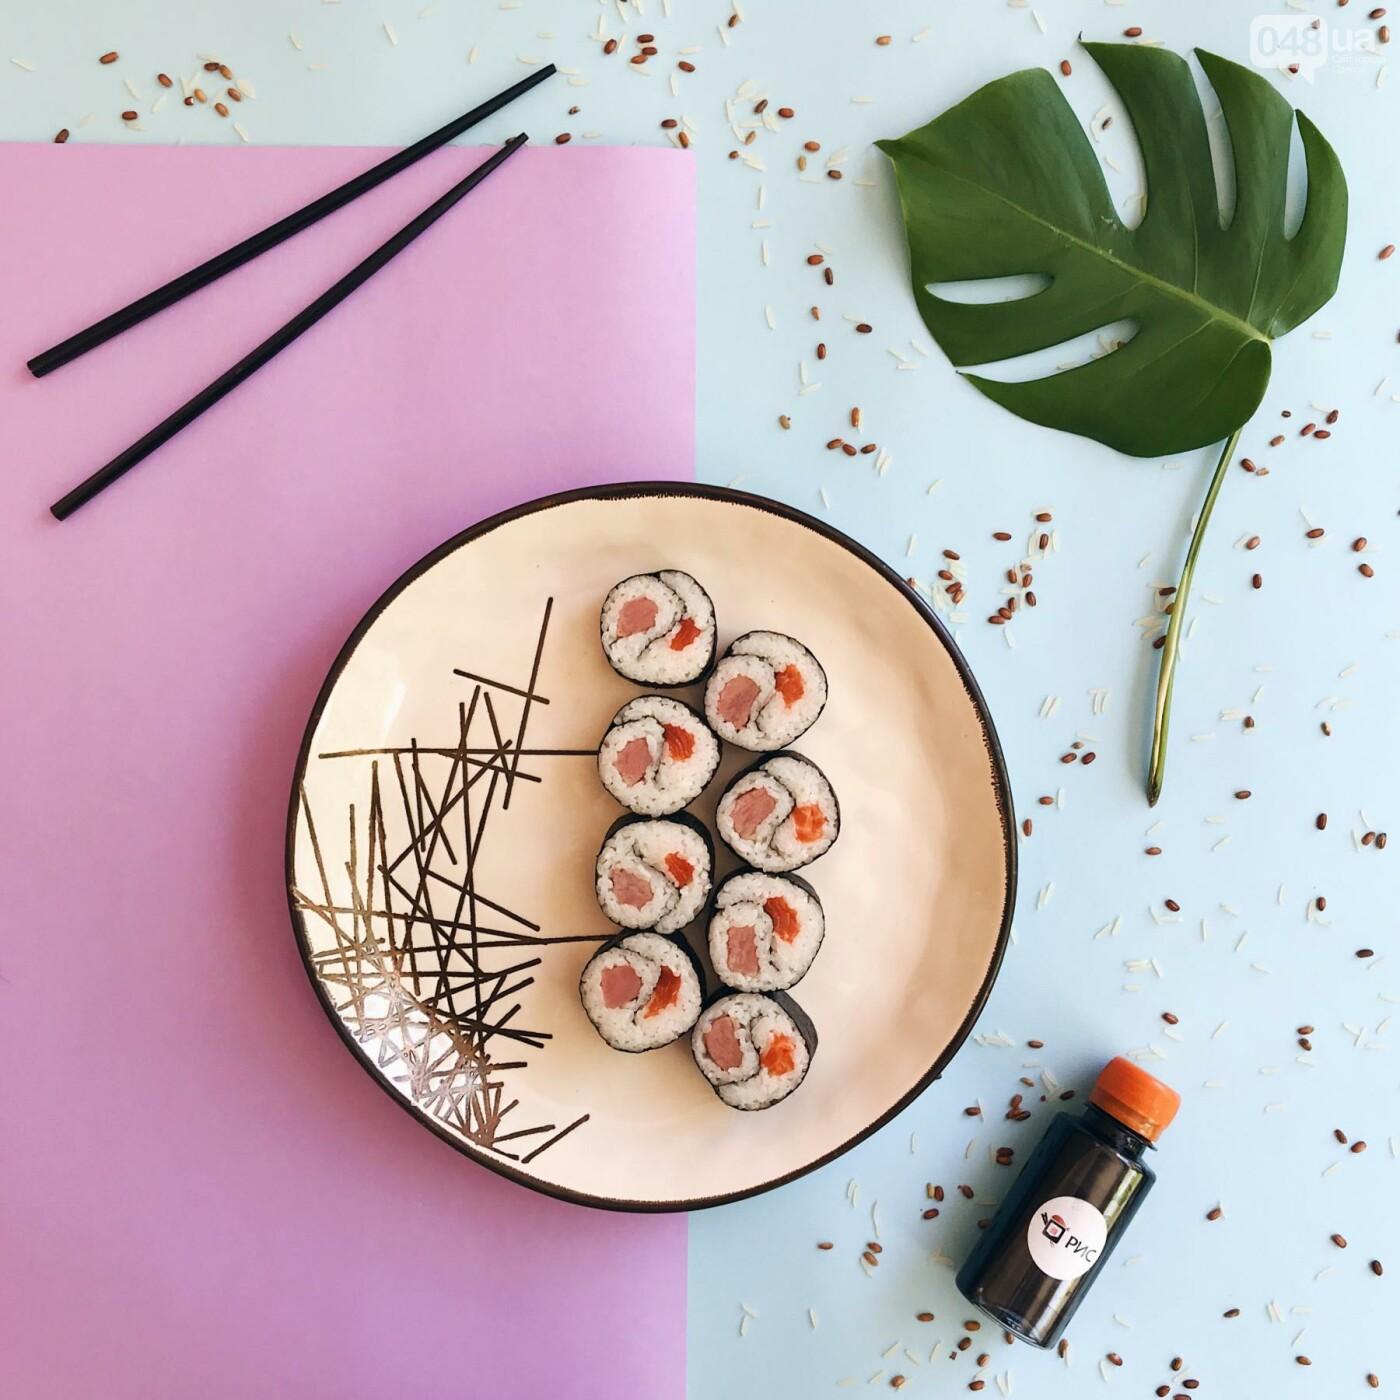 ris.od.ua - японская кухня у вас дома!, фото-4